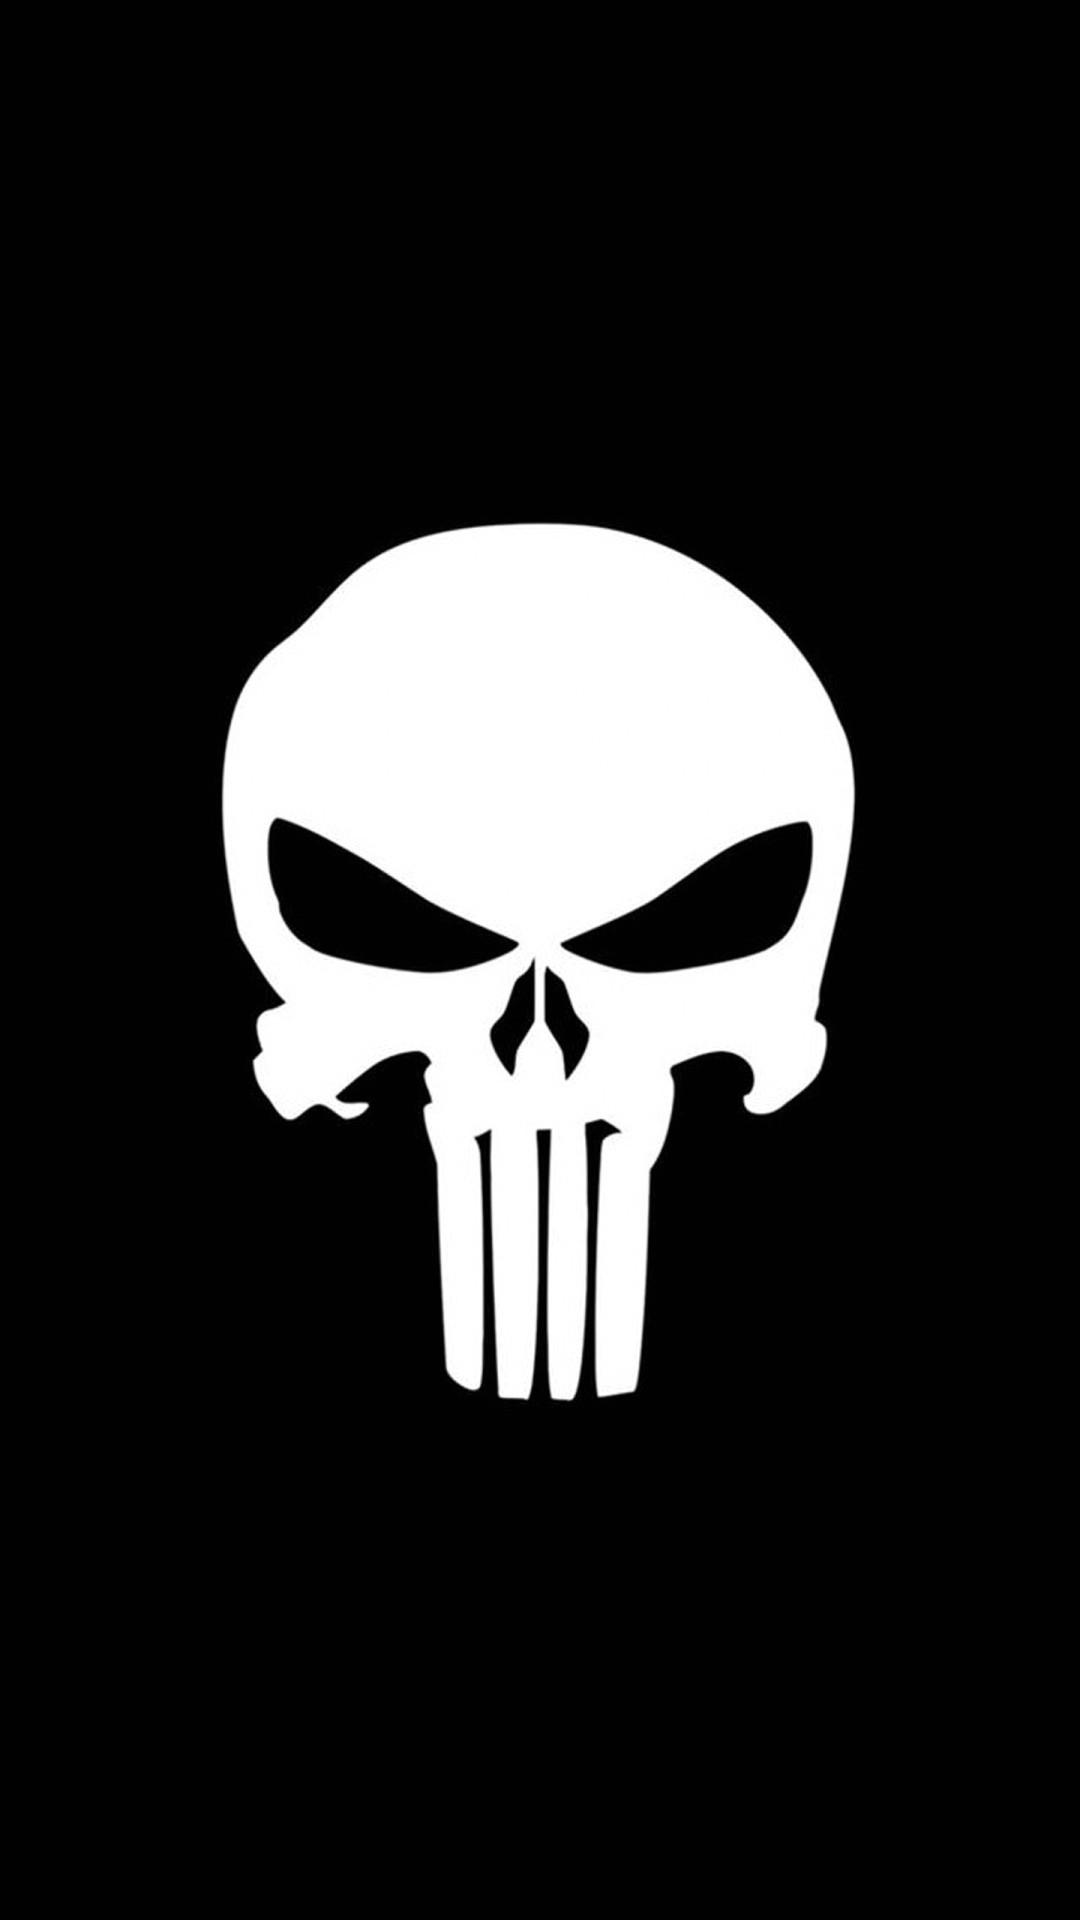 Hard Scary Skull Black Punisher Games Geeks